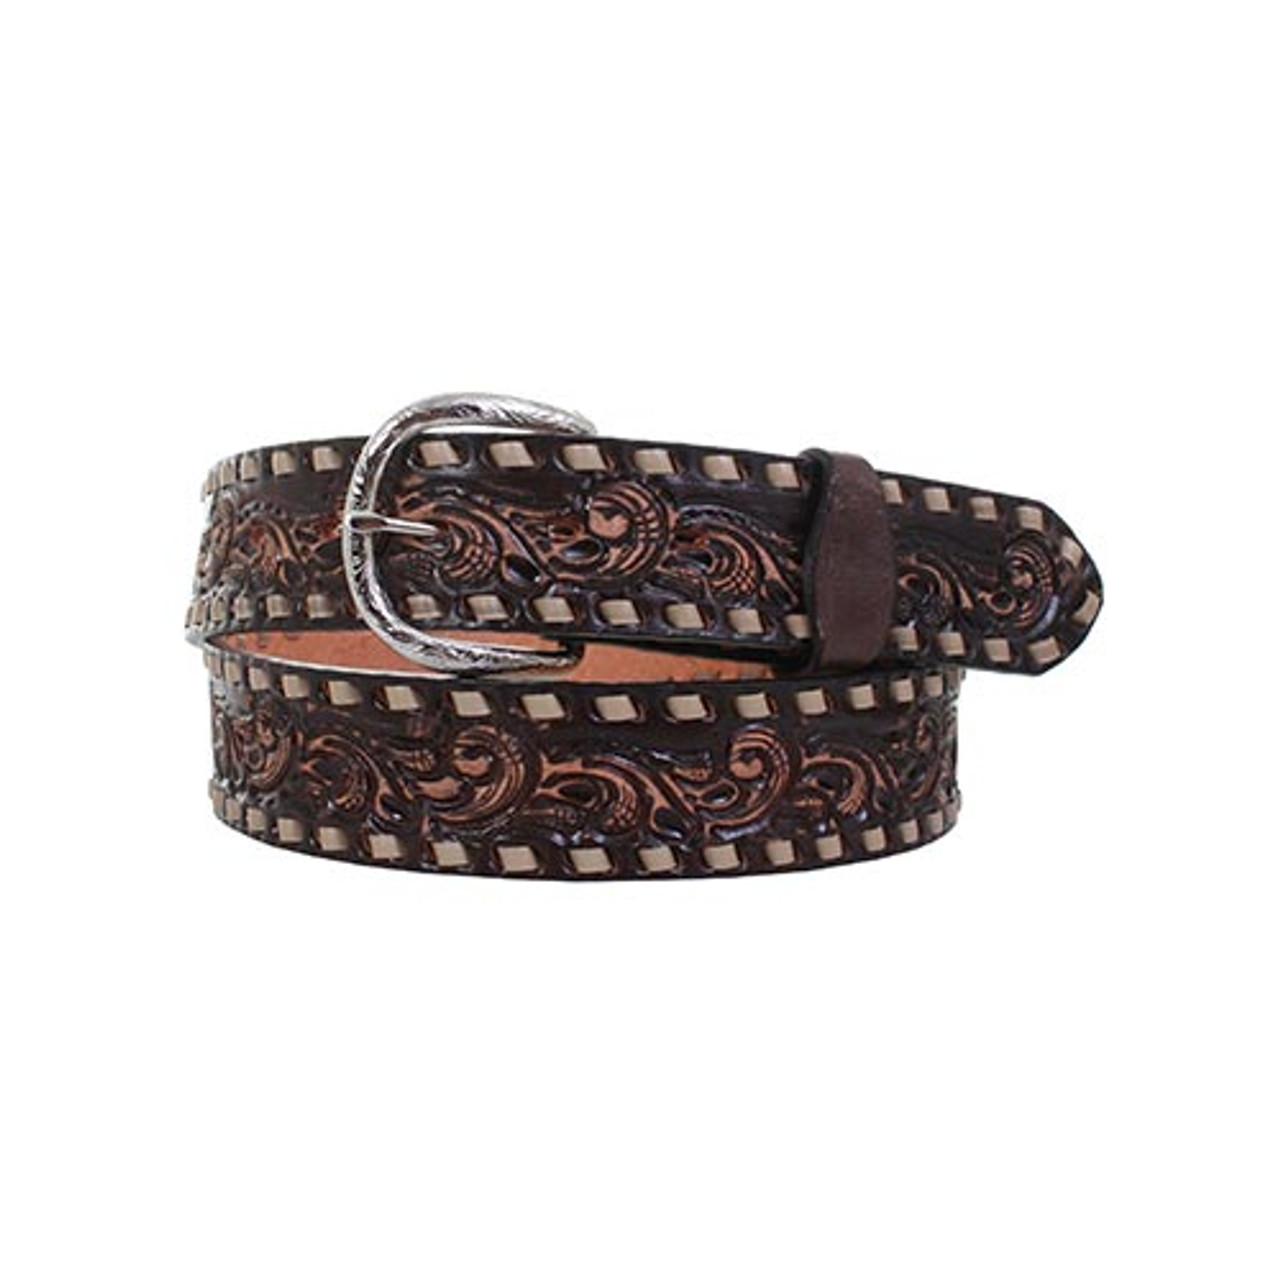 Double J Saddlery Men's Belts - 1 1/2 Brown Vintage Whirlwind Tooled Belt  W/ Cream Buckstitch